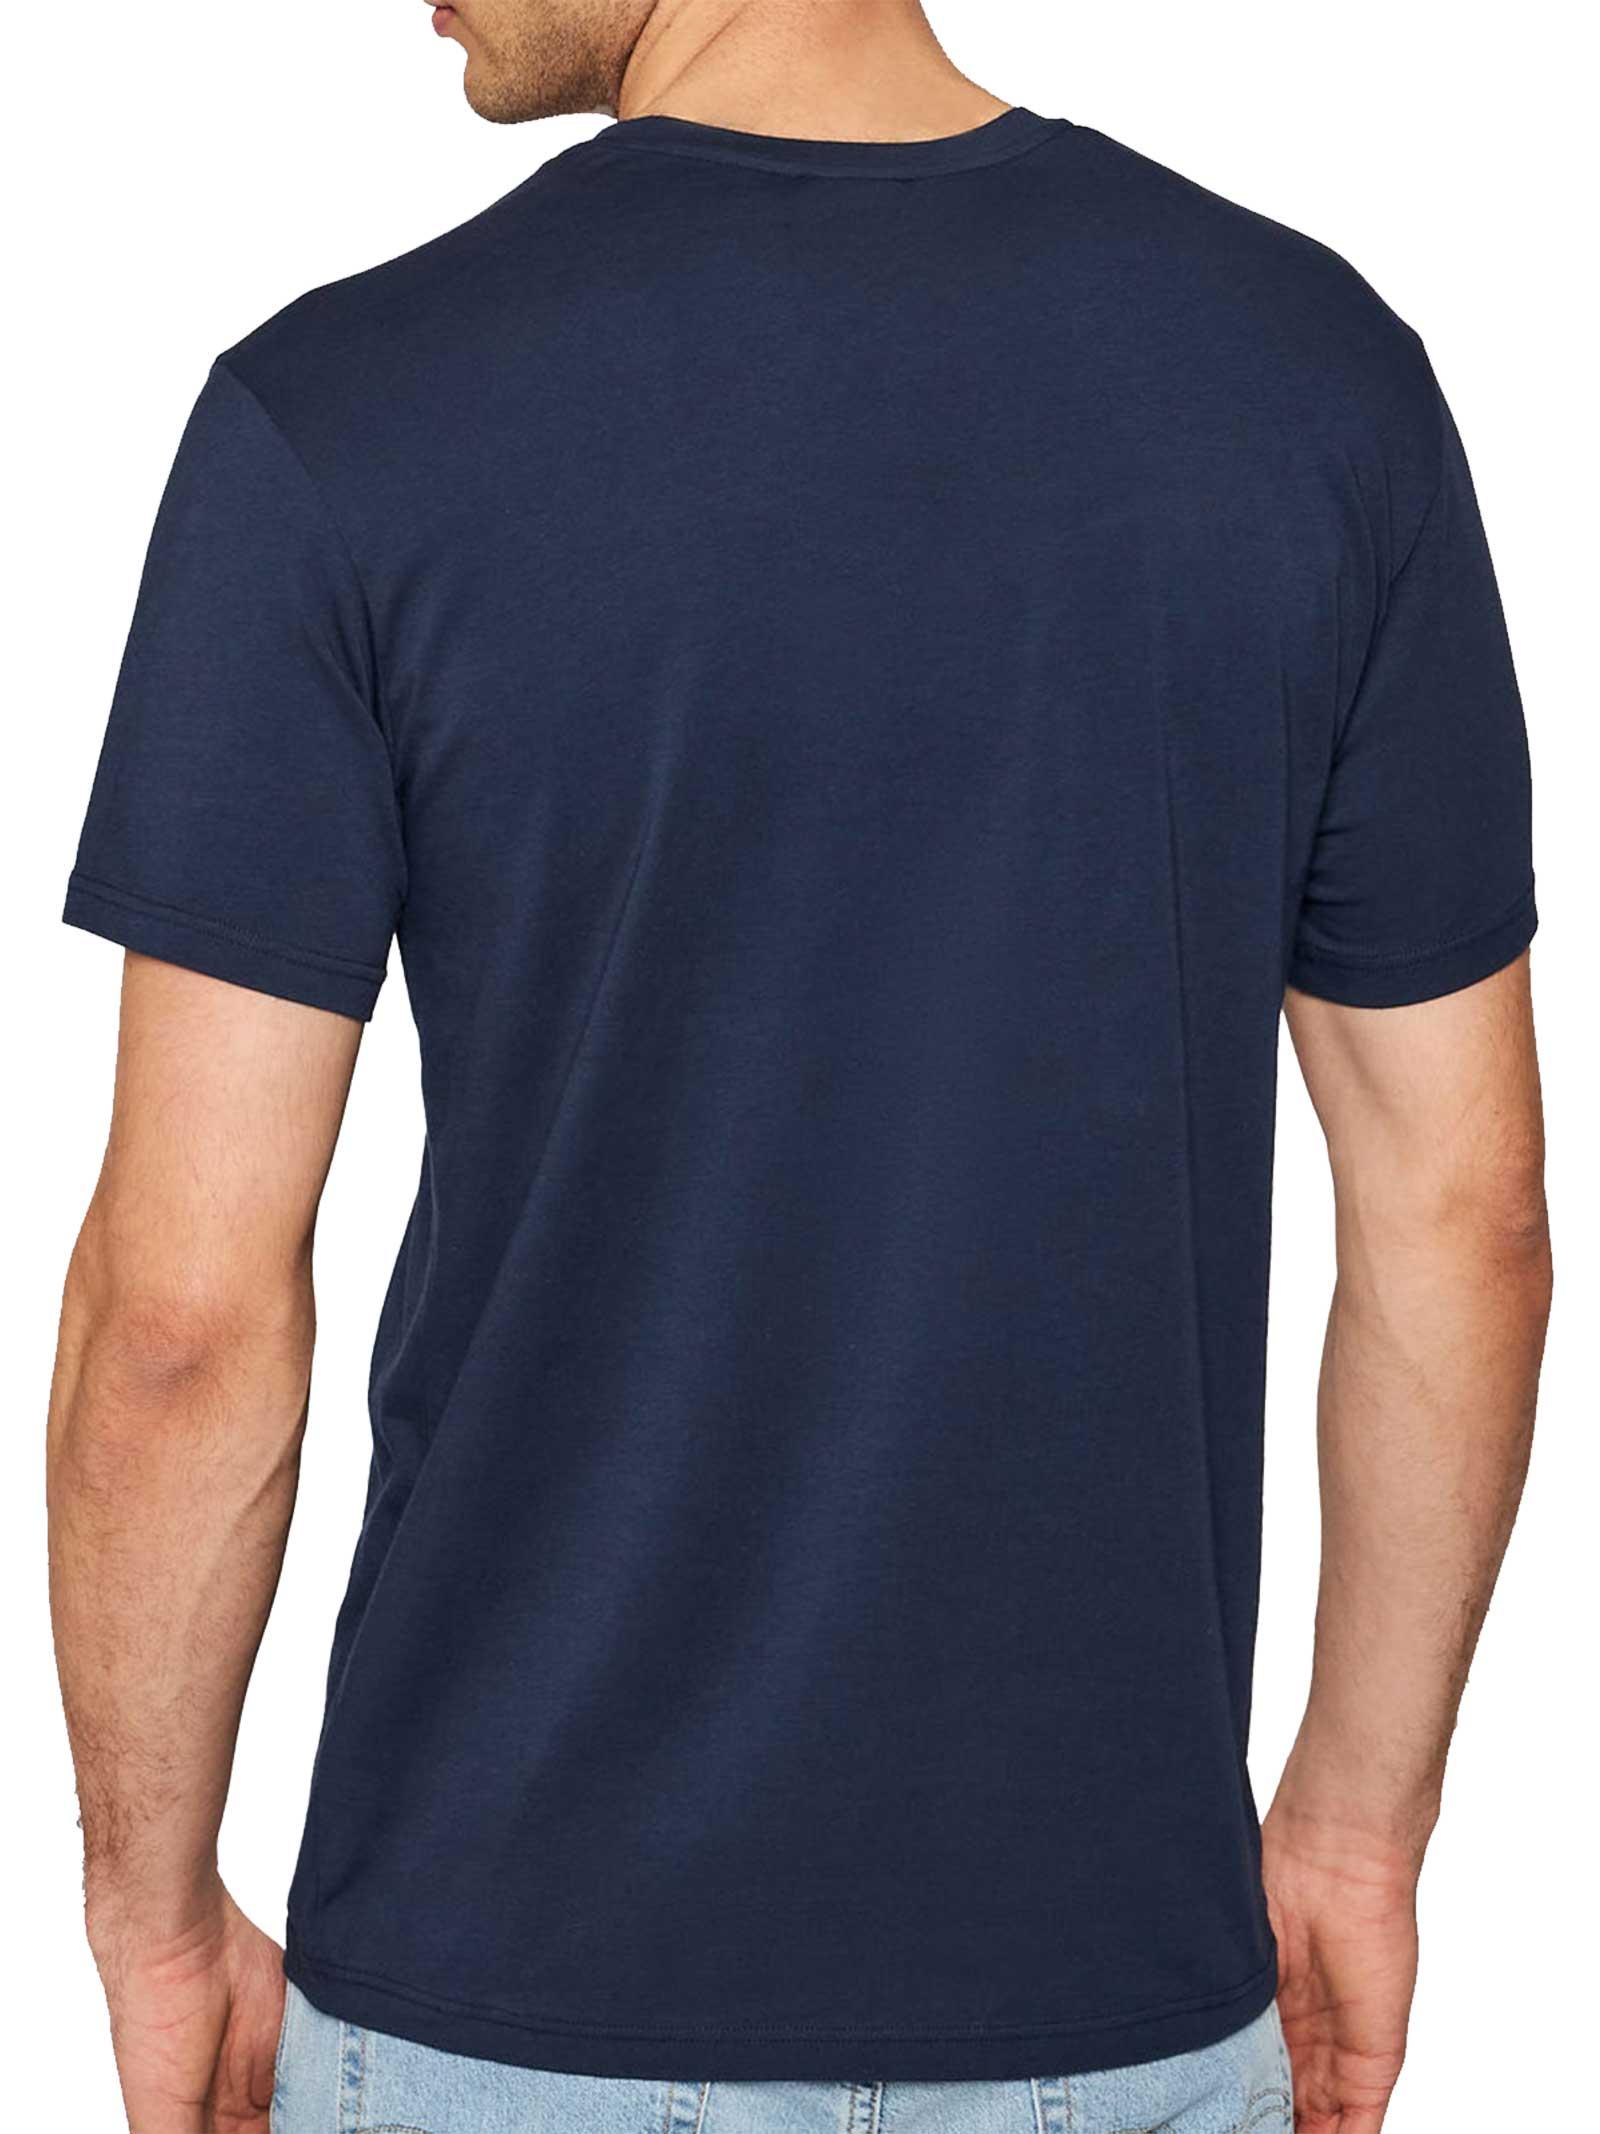 2 PACK T-SHIRT UOMO EMPORIO ARMANI   T-shirt   111267-1P72027435